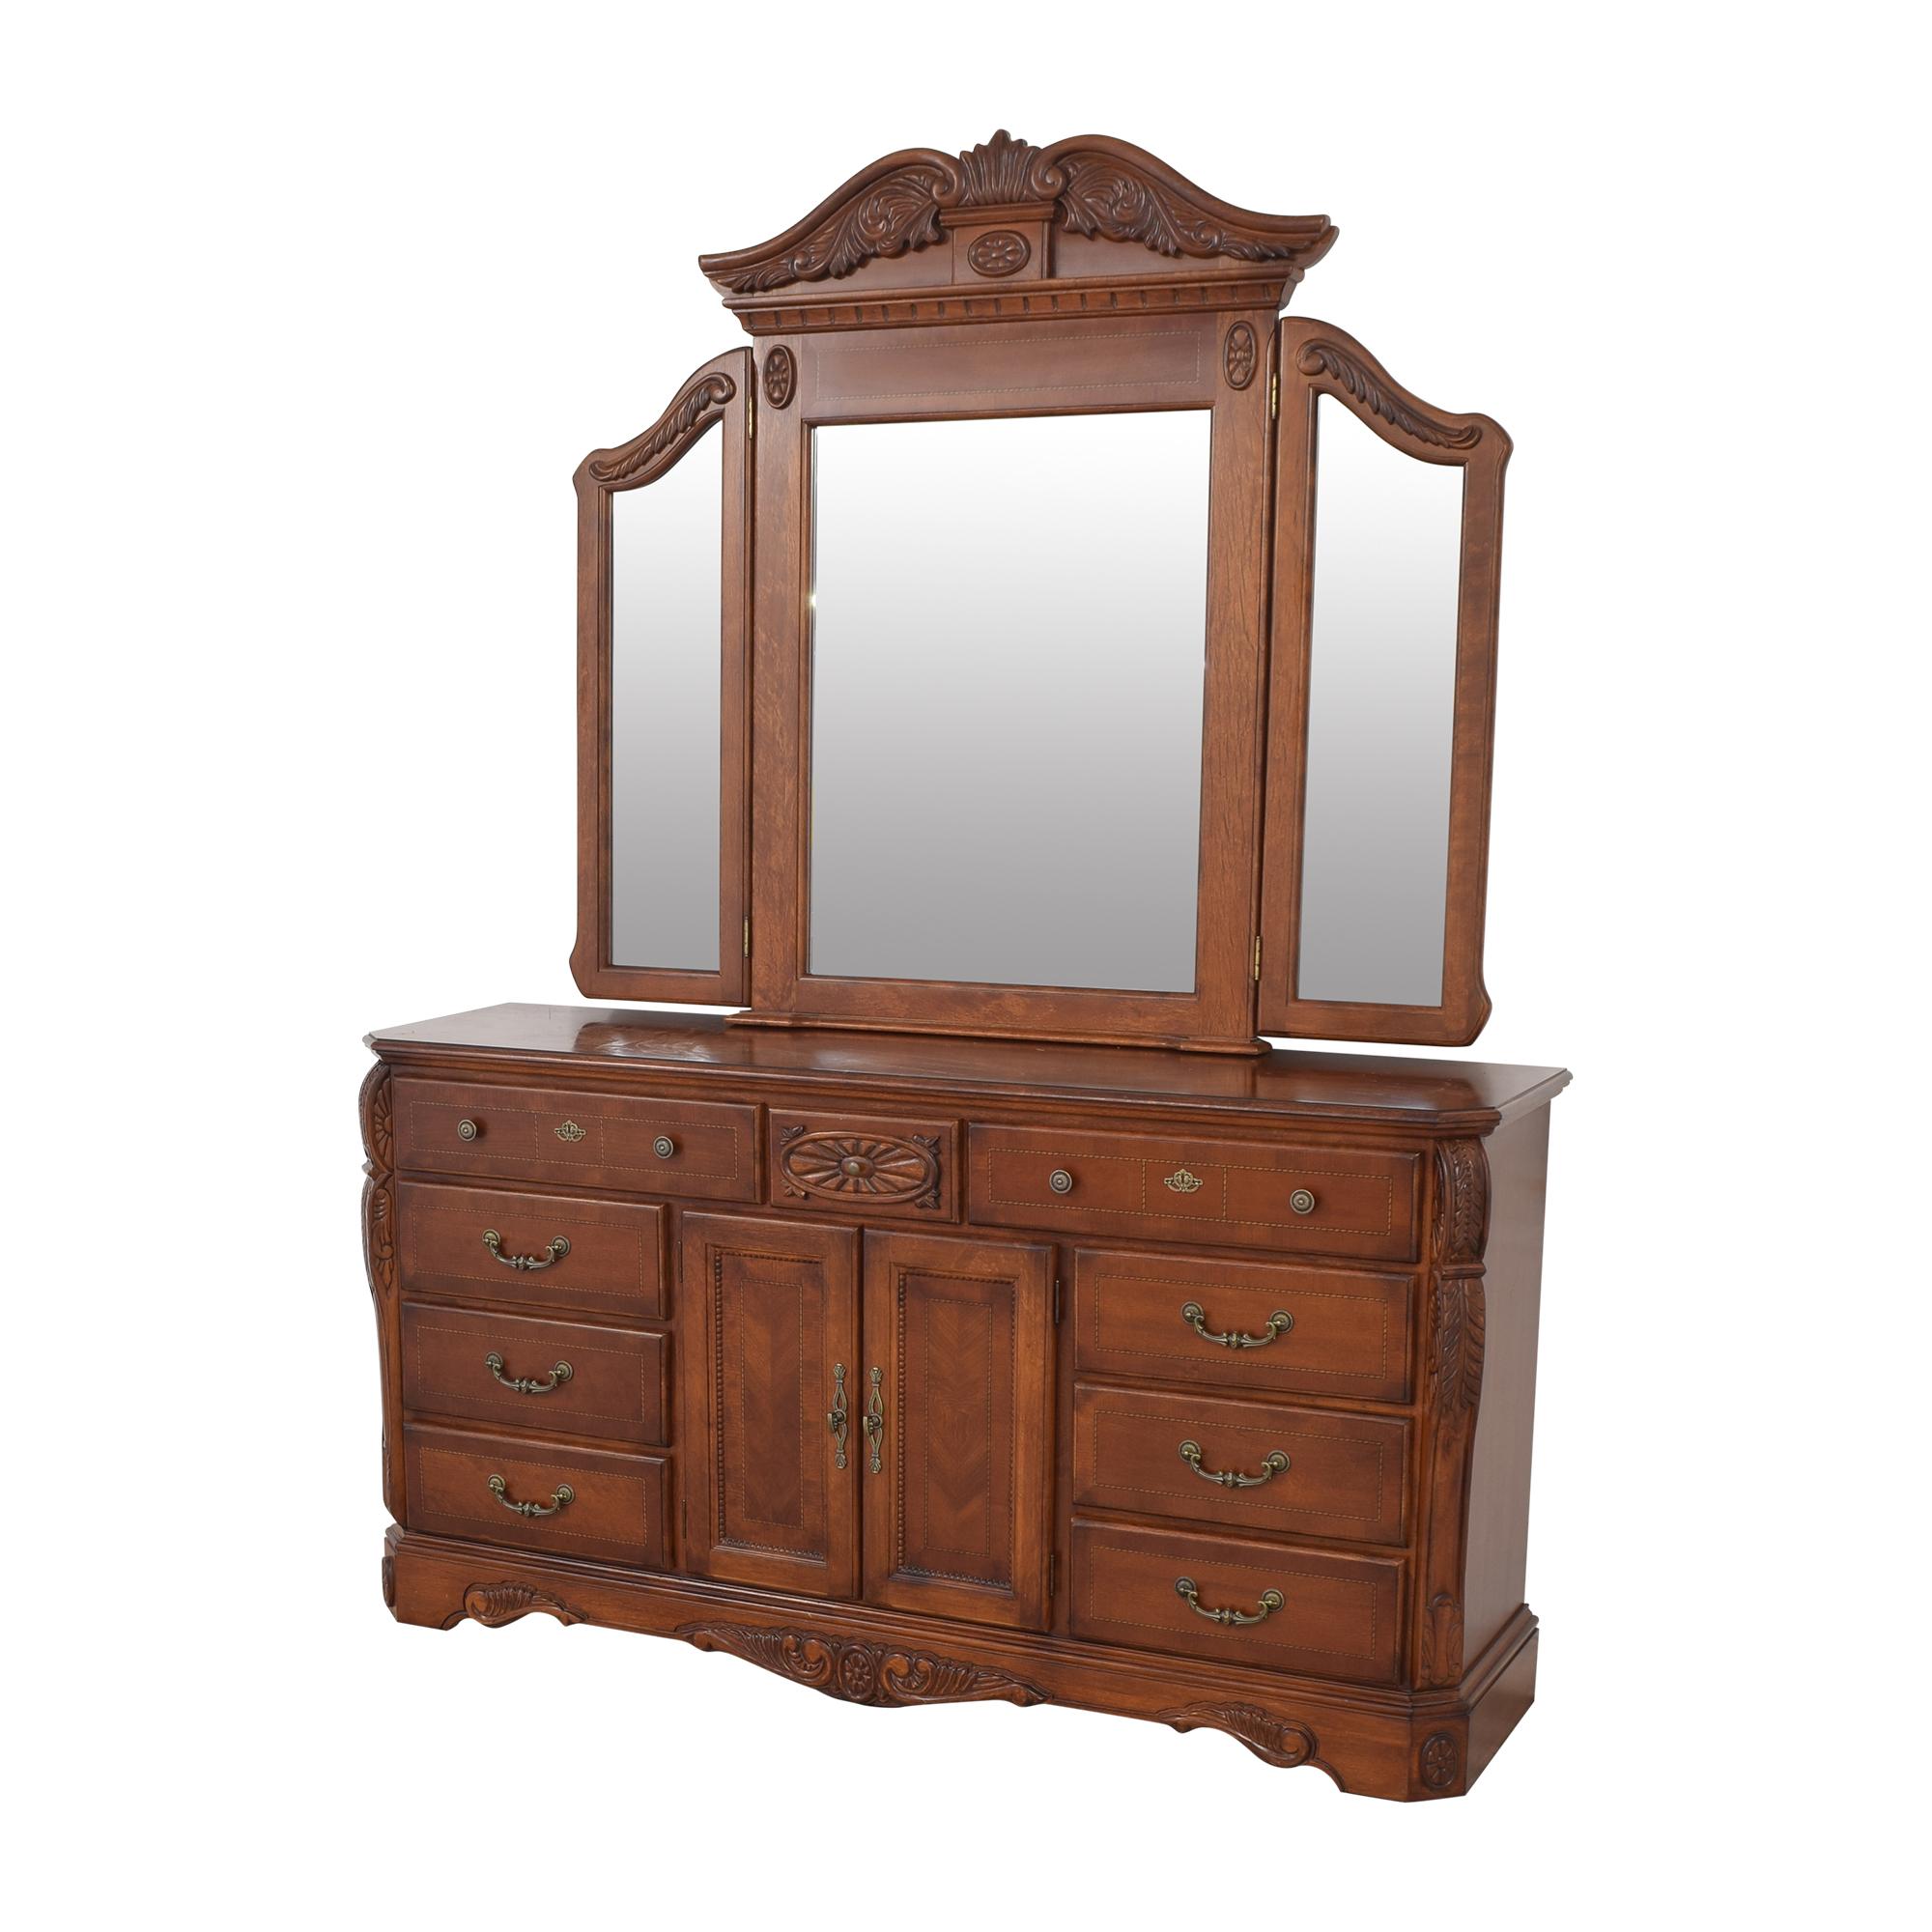 Dresser with Tri Fold Mirror / Storage